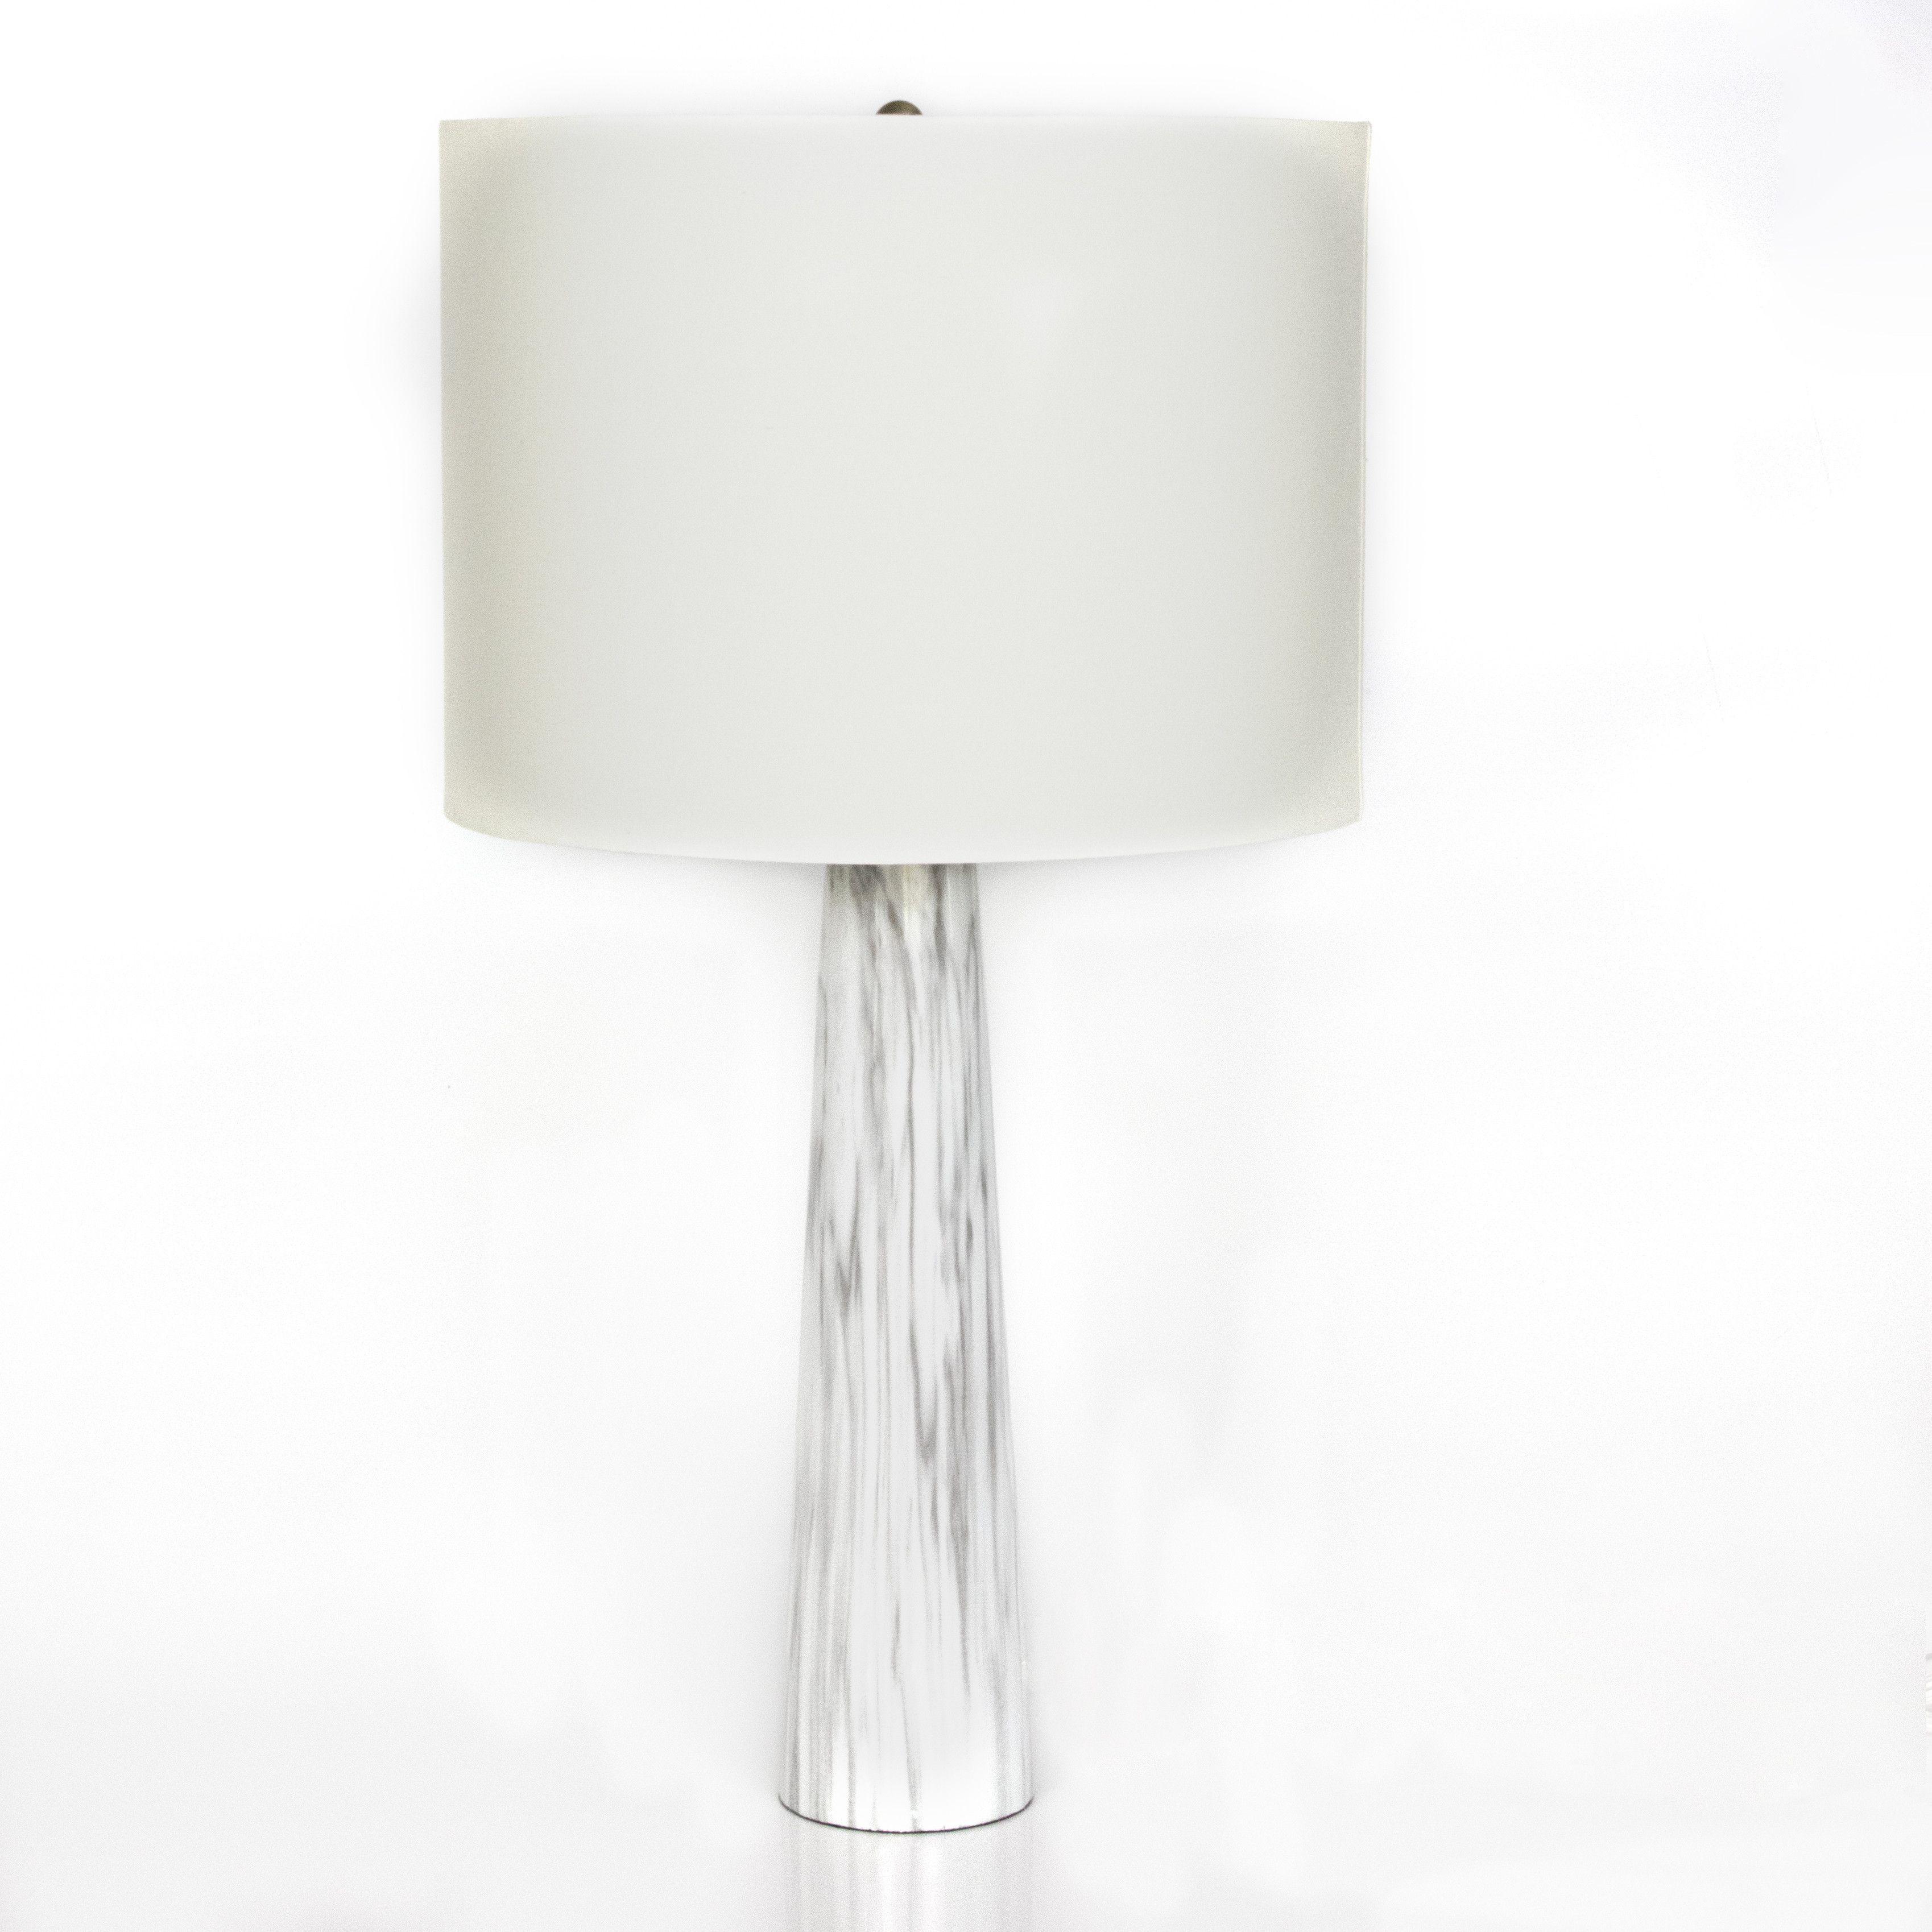 colorful lamp marble base vintage desafiocincodias